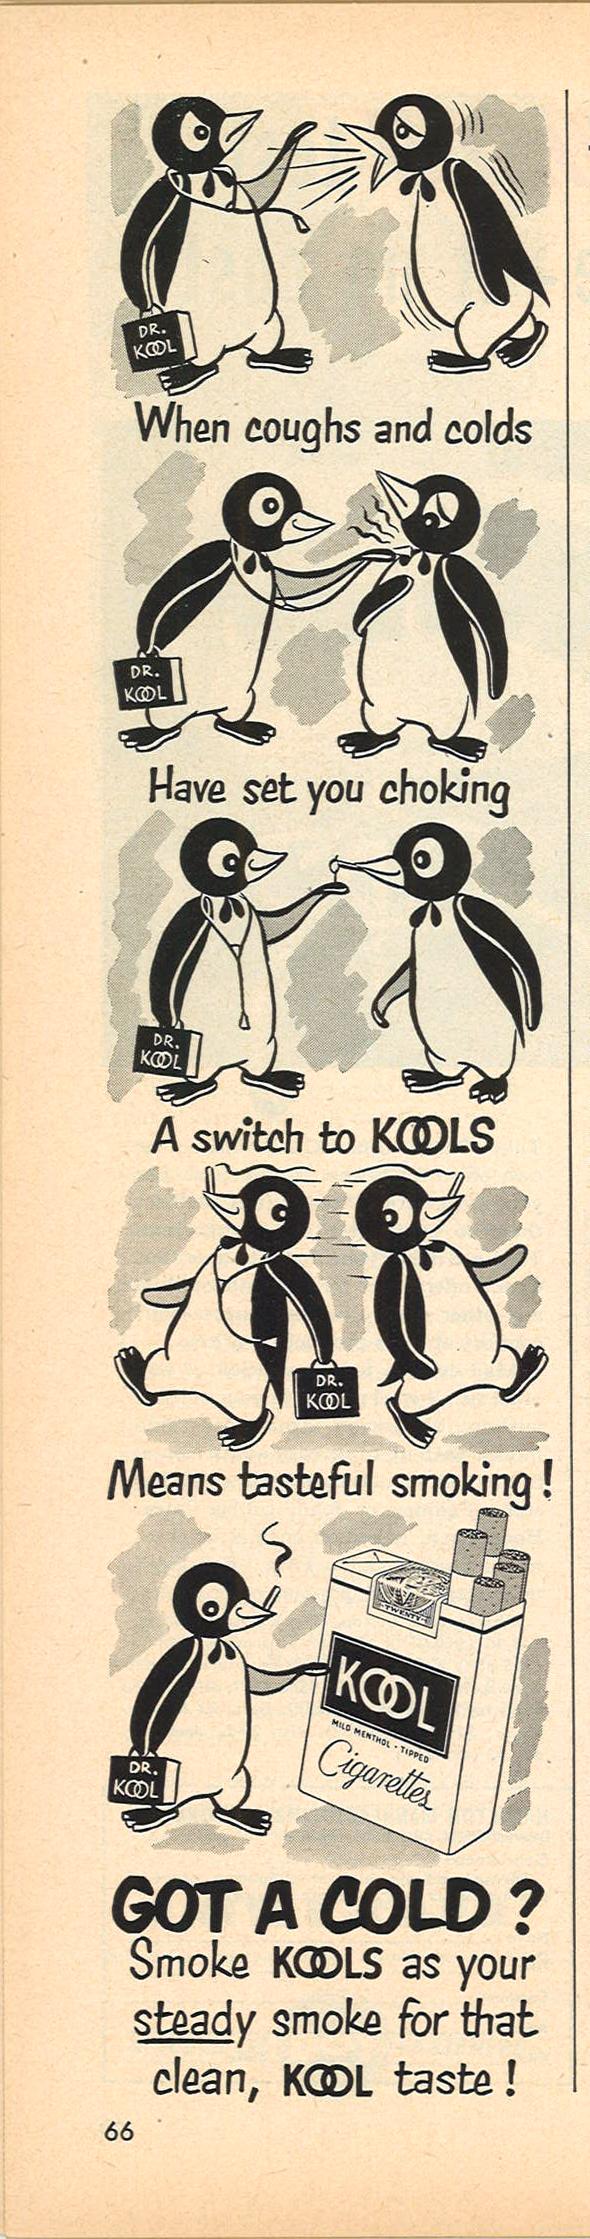 1952 03 24 Time Kool Ad Got a Cold